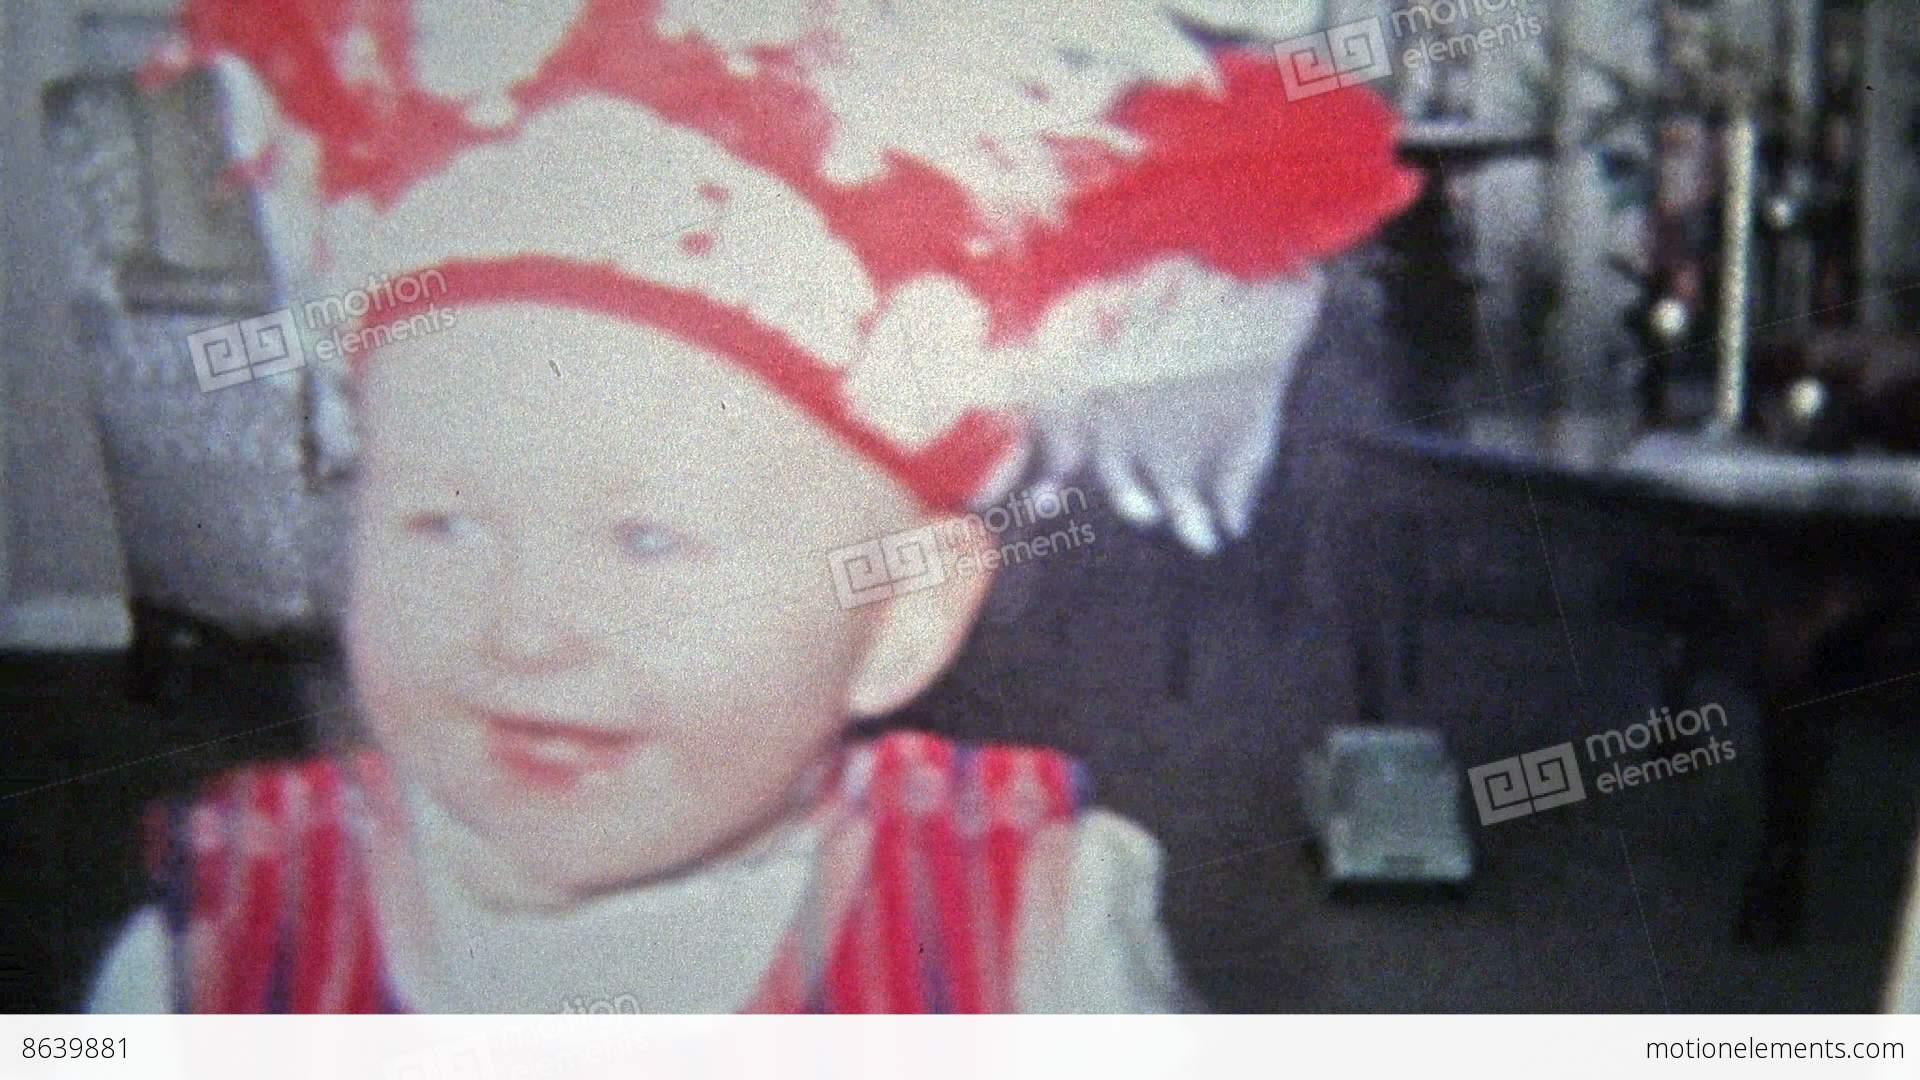 toledo, ohio 1968: halloween kid raiders native american headdress